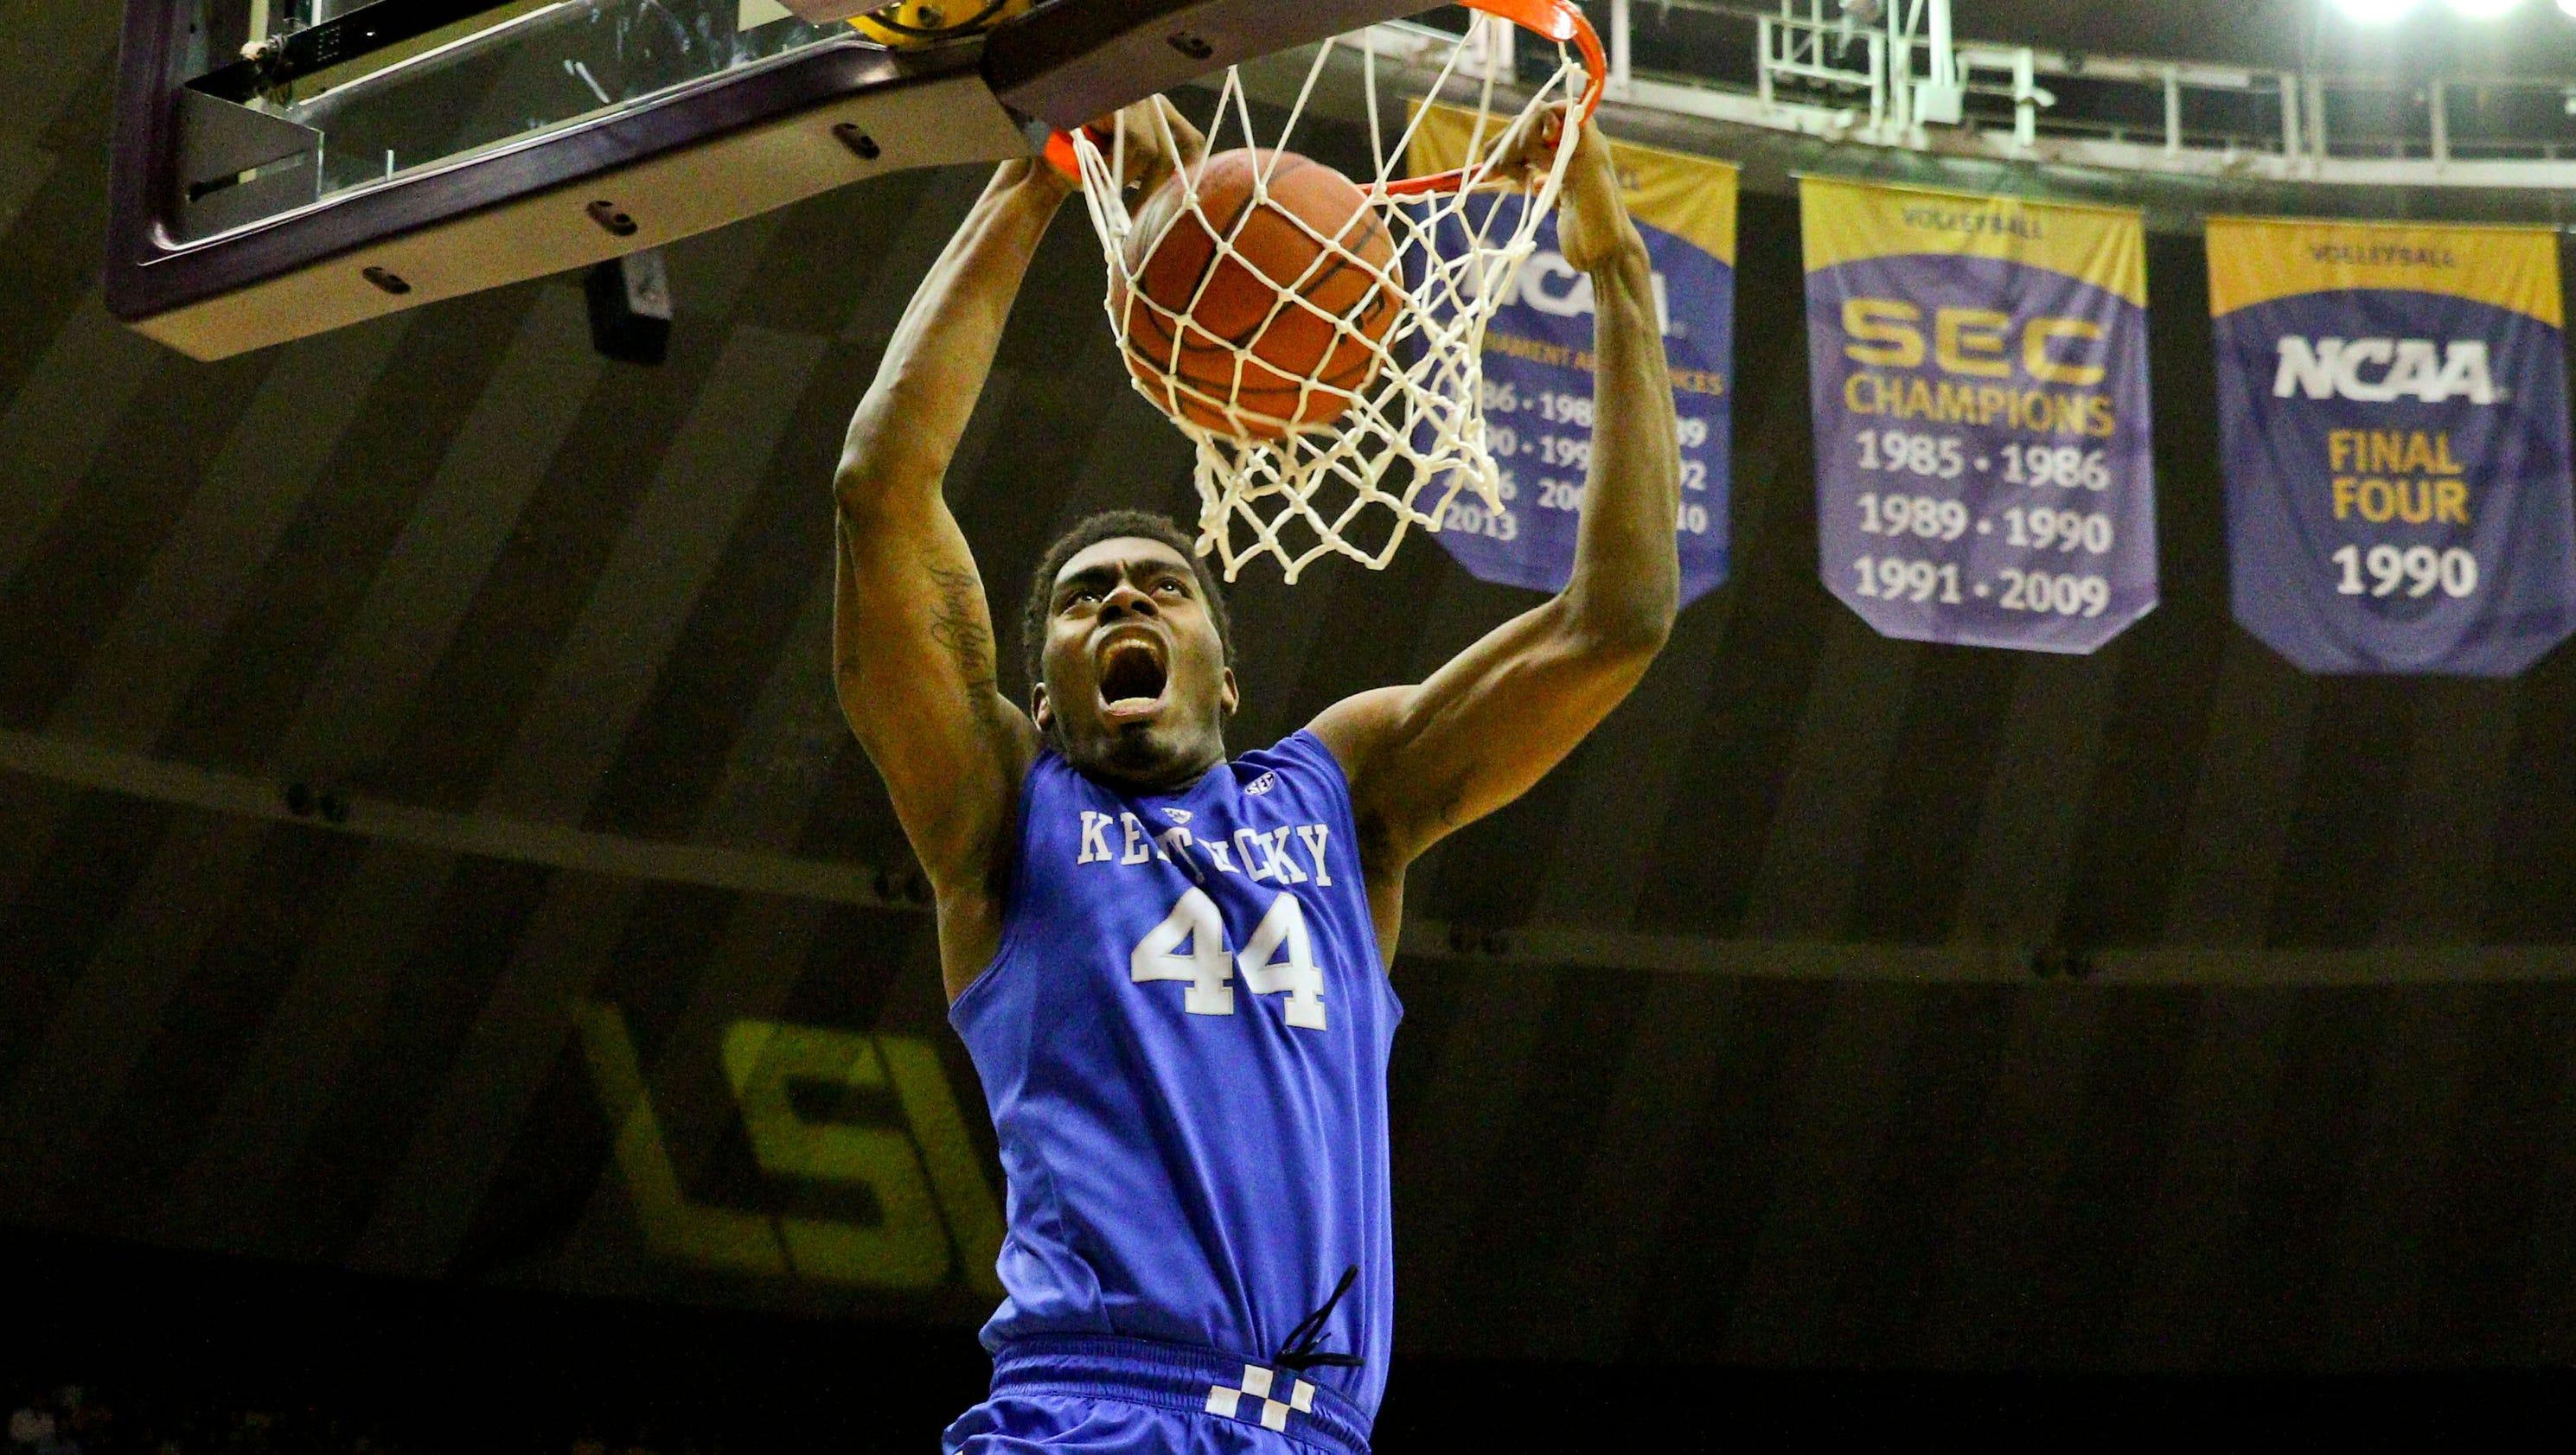 Kentucky Wildcats Basketball Full 2015 16 Schedule: Tuesday Tip-off: Can Tennessee Knock Off No. 1 Kentucky?